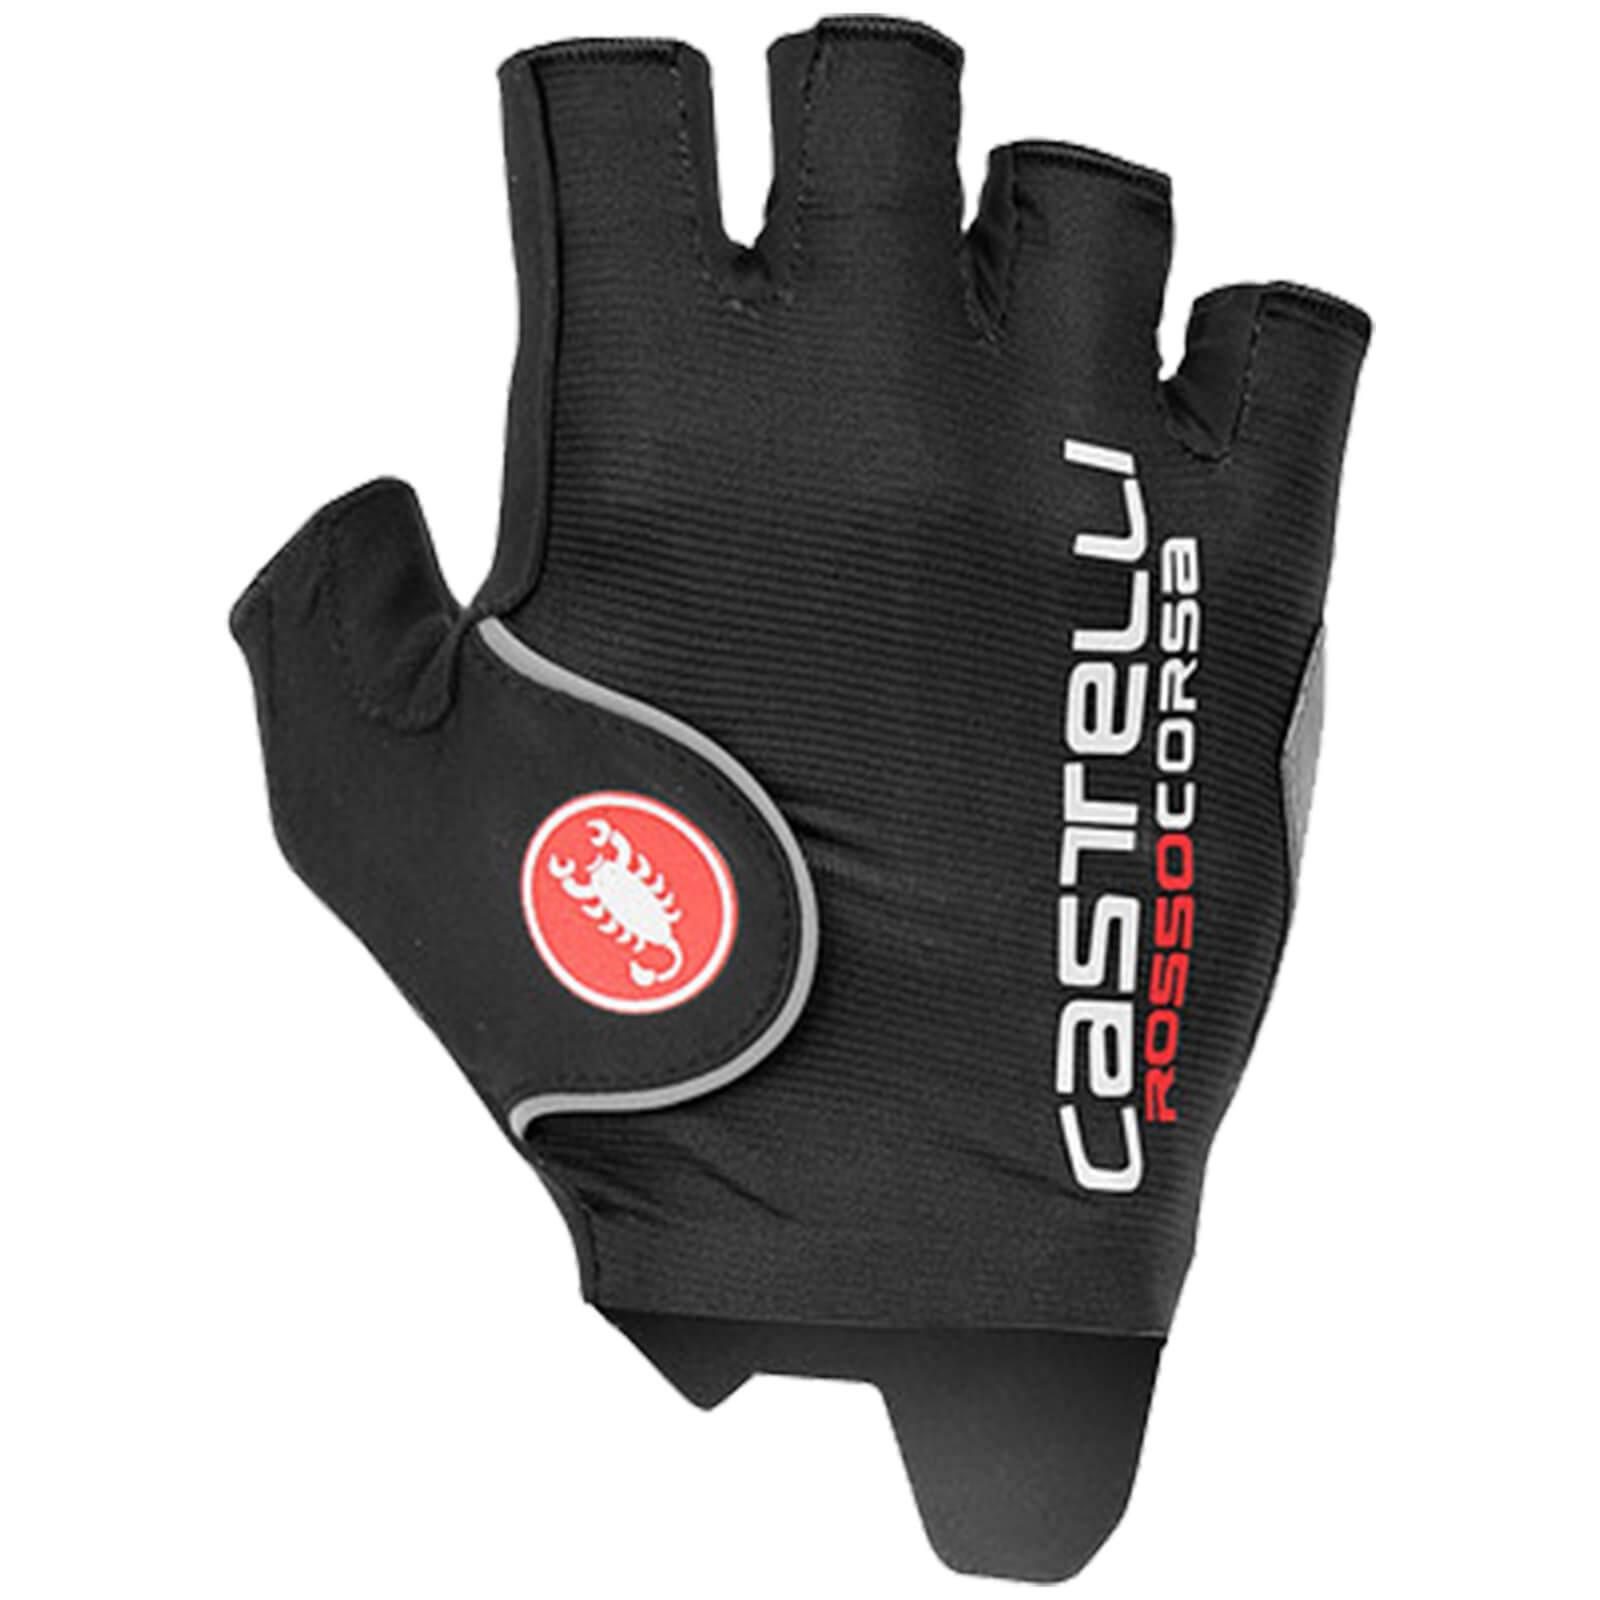 Castelli Rosso Corsa Pro Gloves - Black - S - Black